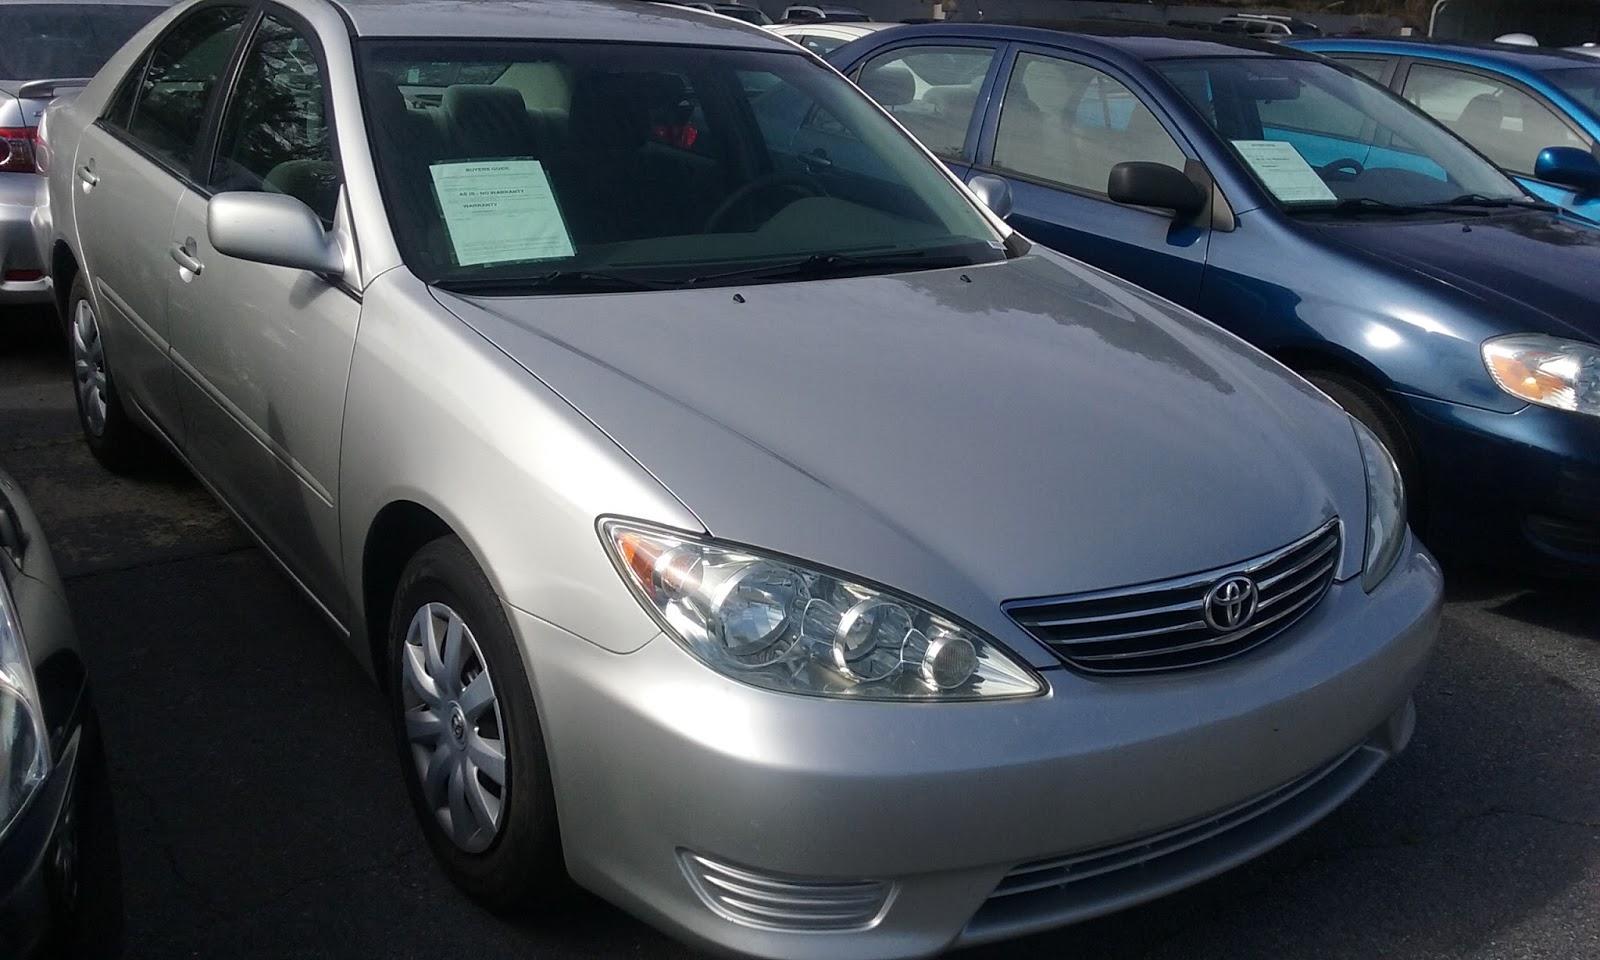 I GOT CAR DEALS : 2006 Toyota Camry 148k miles